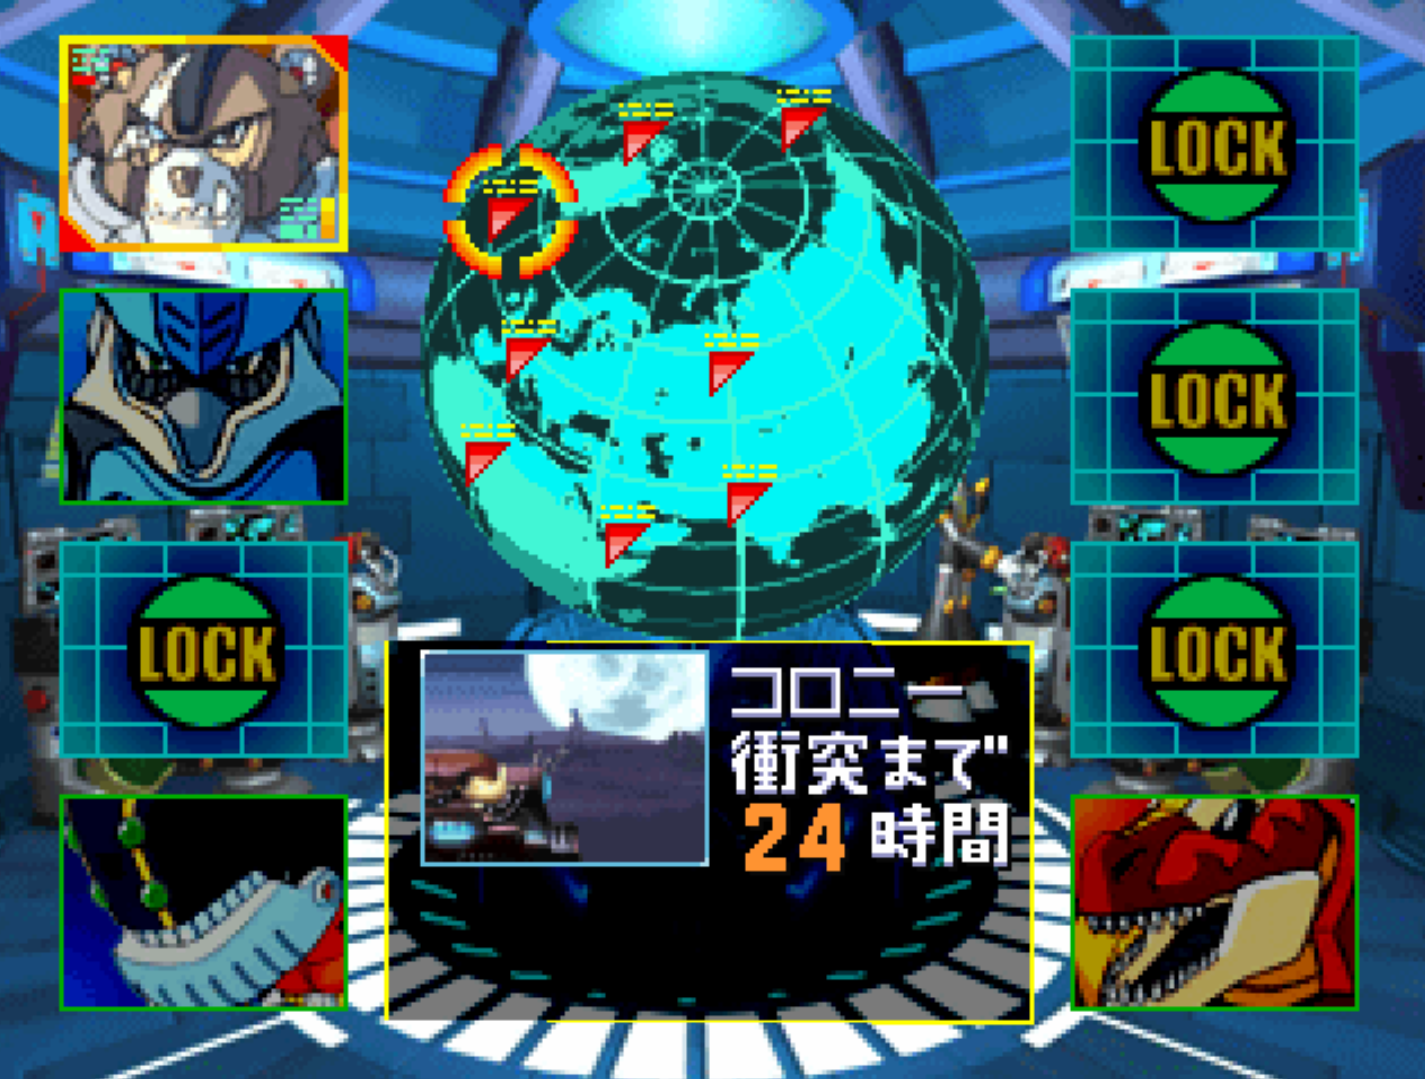 """Rockman""? More like ""Locked, man."""